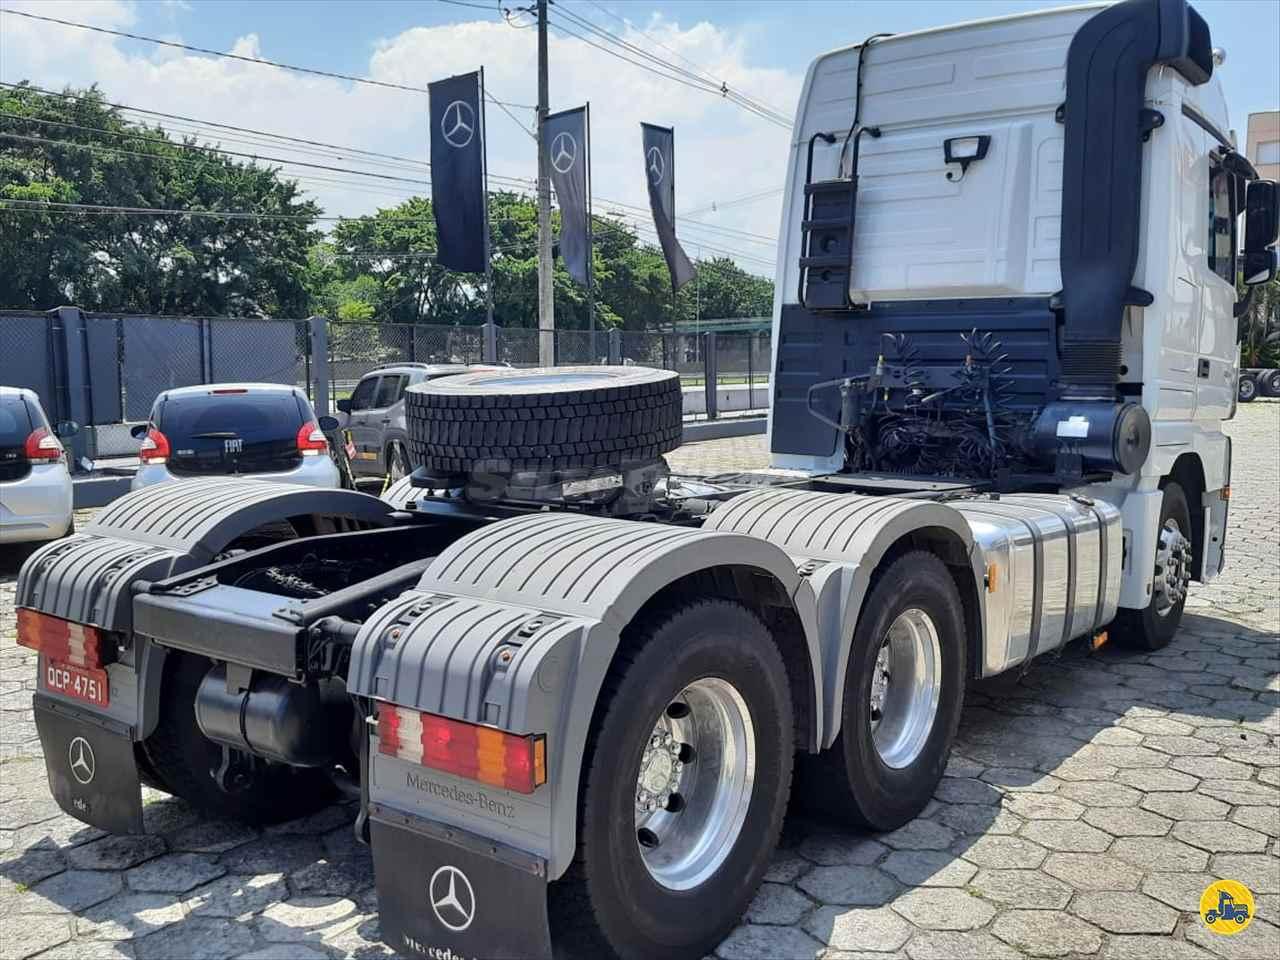 MERCEDES-BENZ MB 2651 307000km 2017/2018 SelecTrucks - Santos